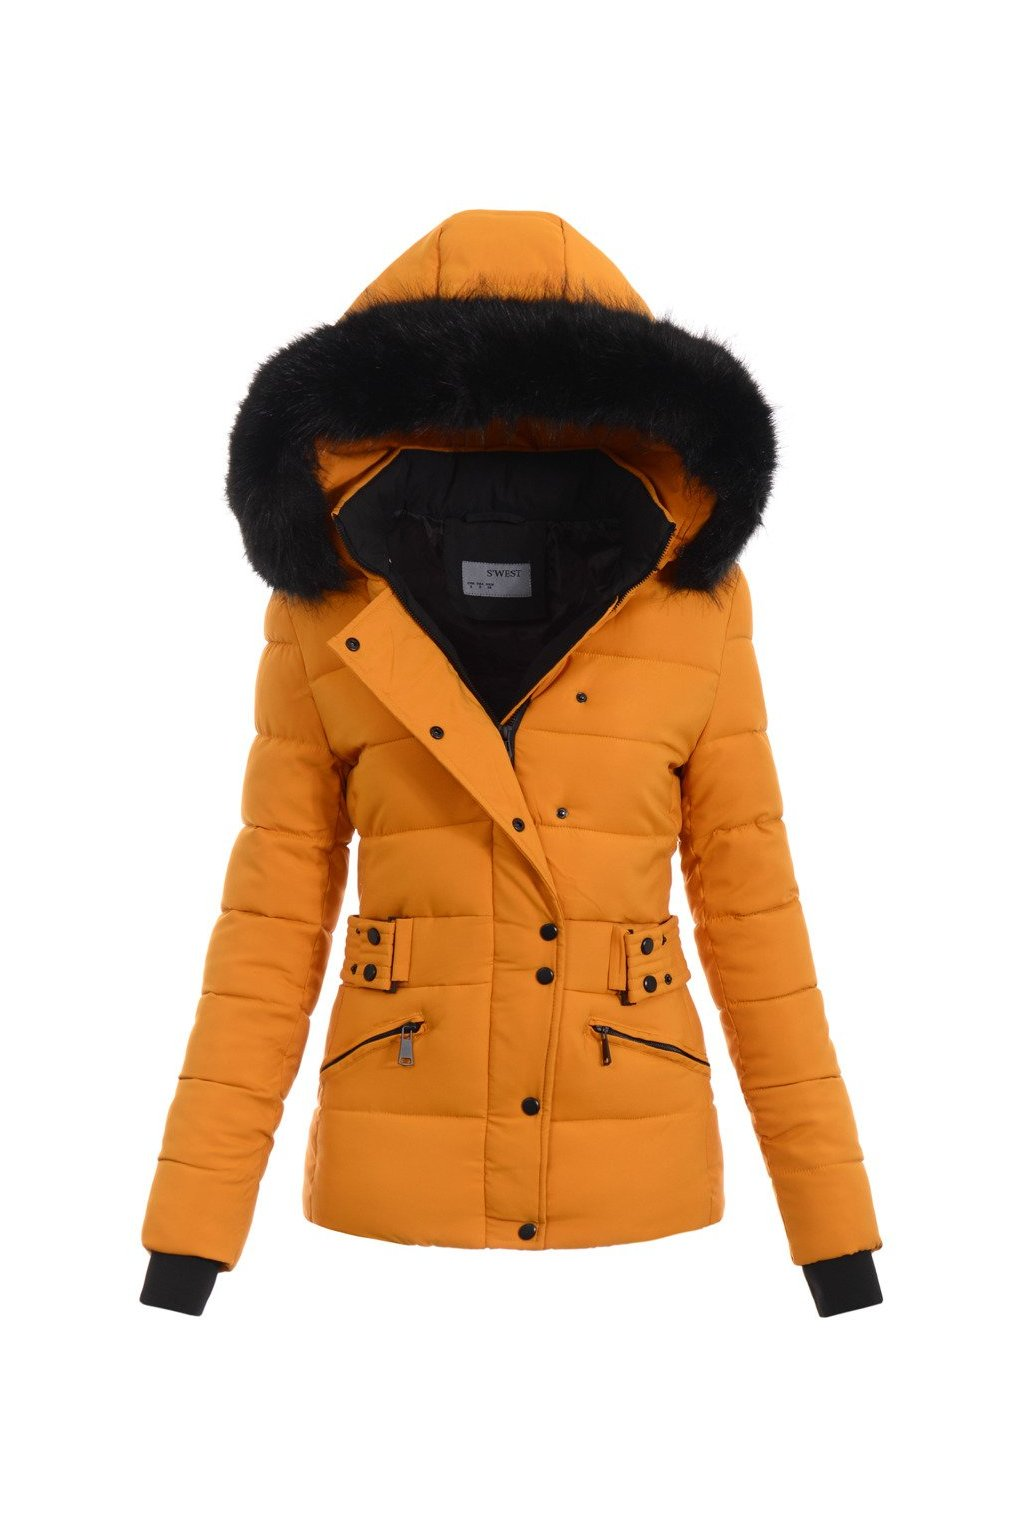 Dámska zimná bunda s kapucňou 4772 žltá